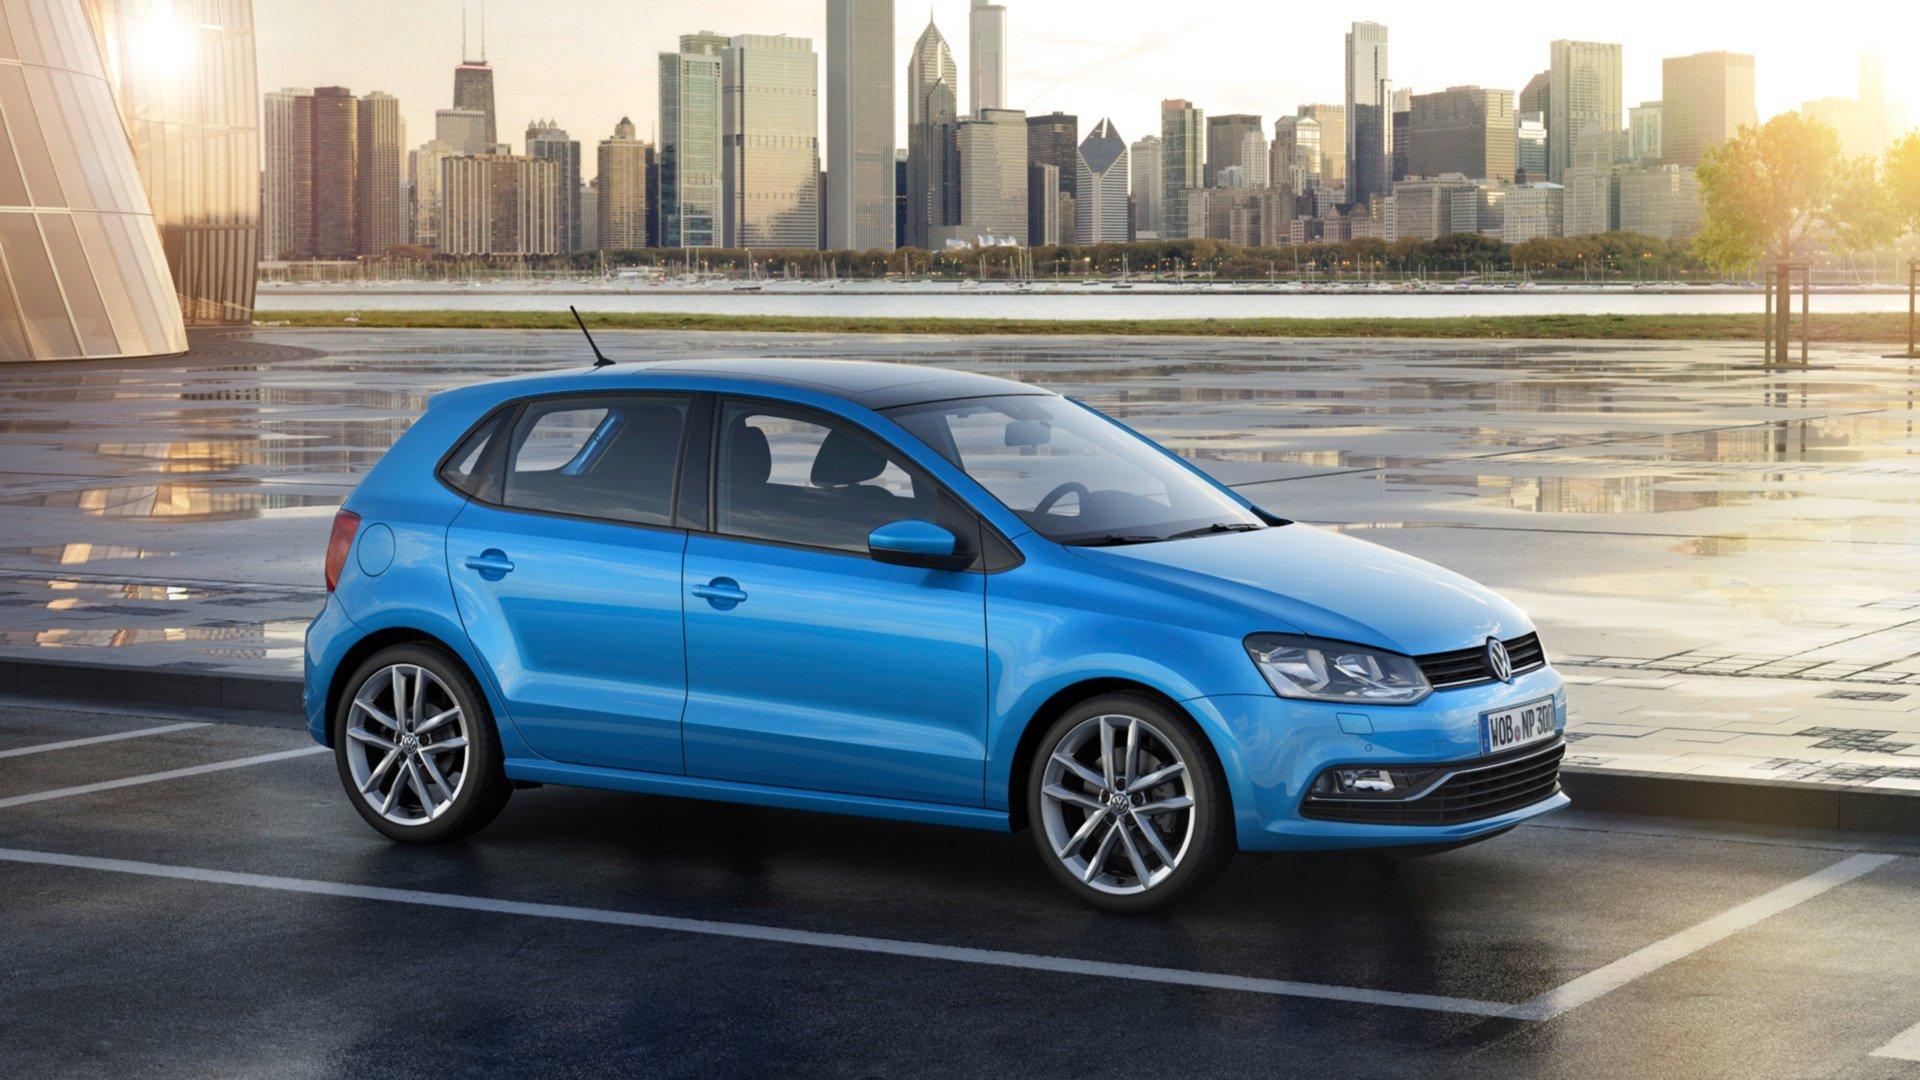 Volkswagen Polo Wallpapers Hd For Desktop Backgrounds